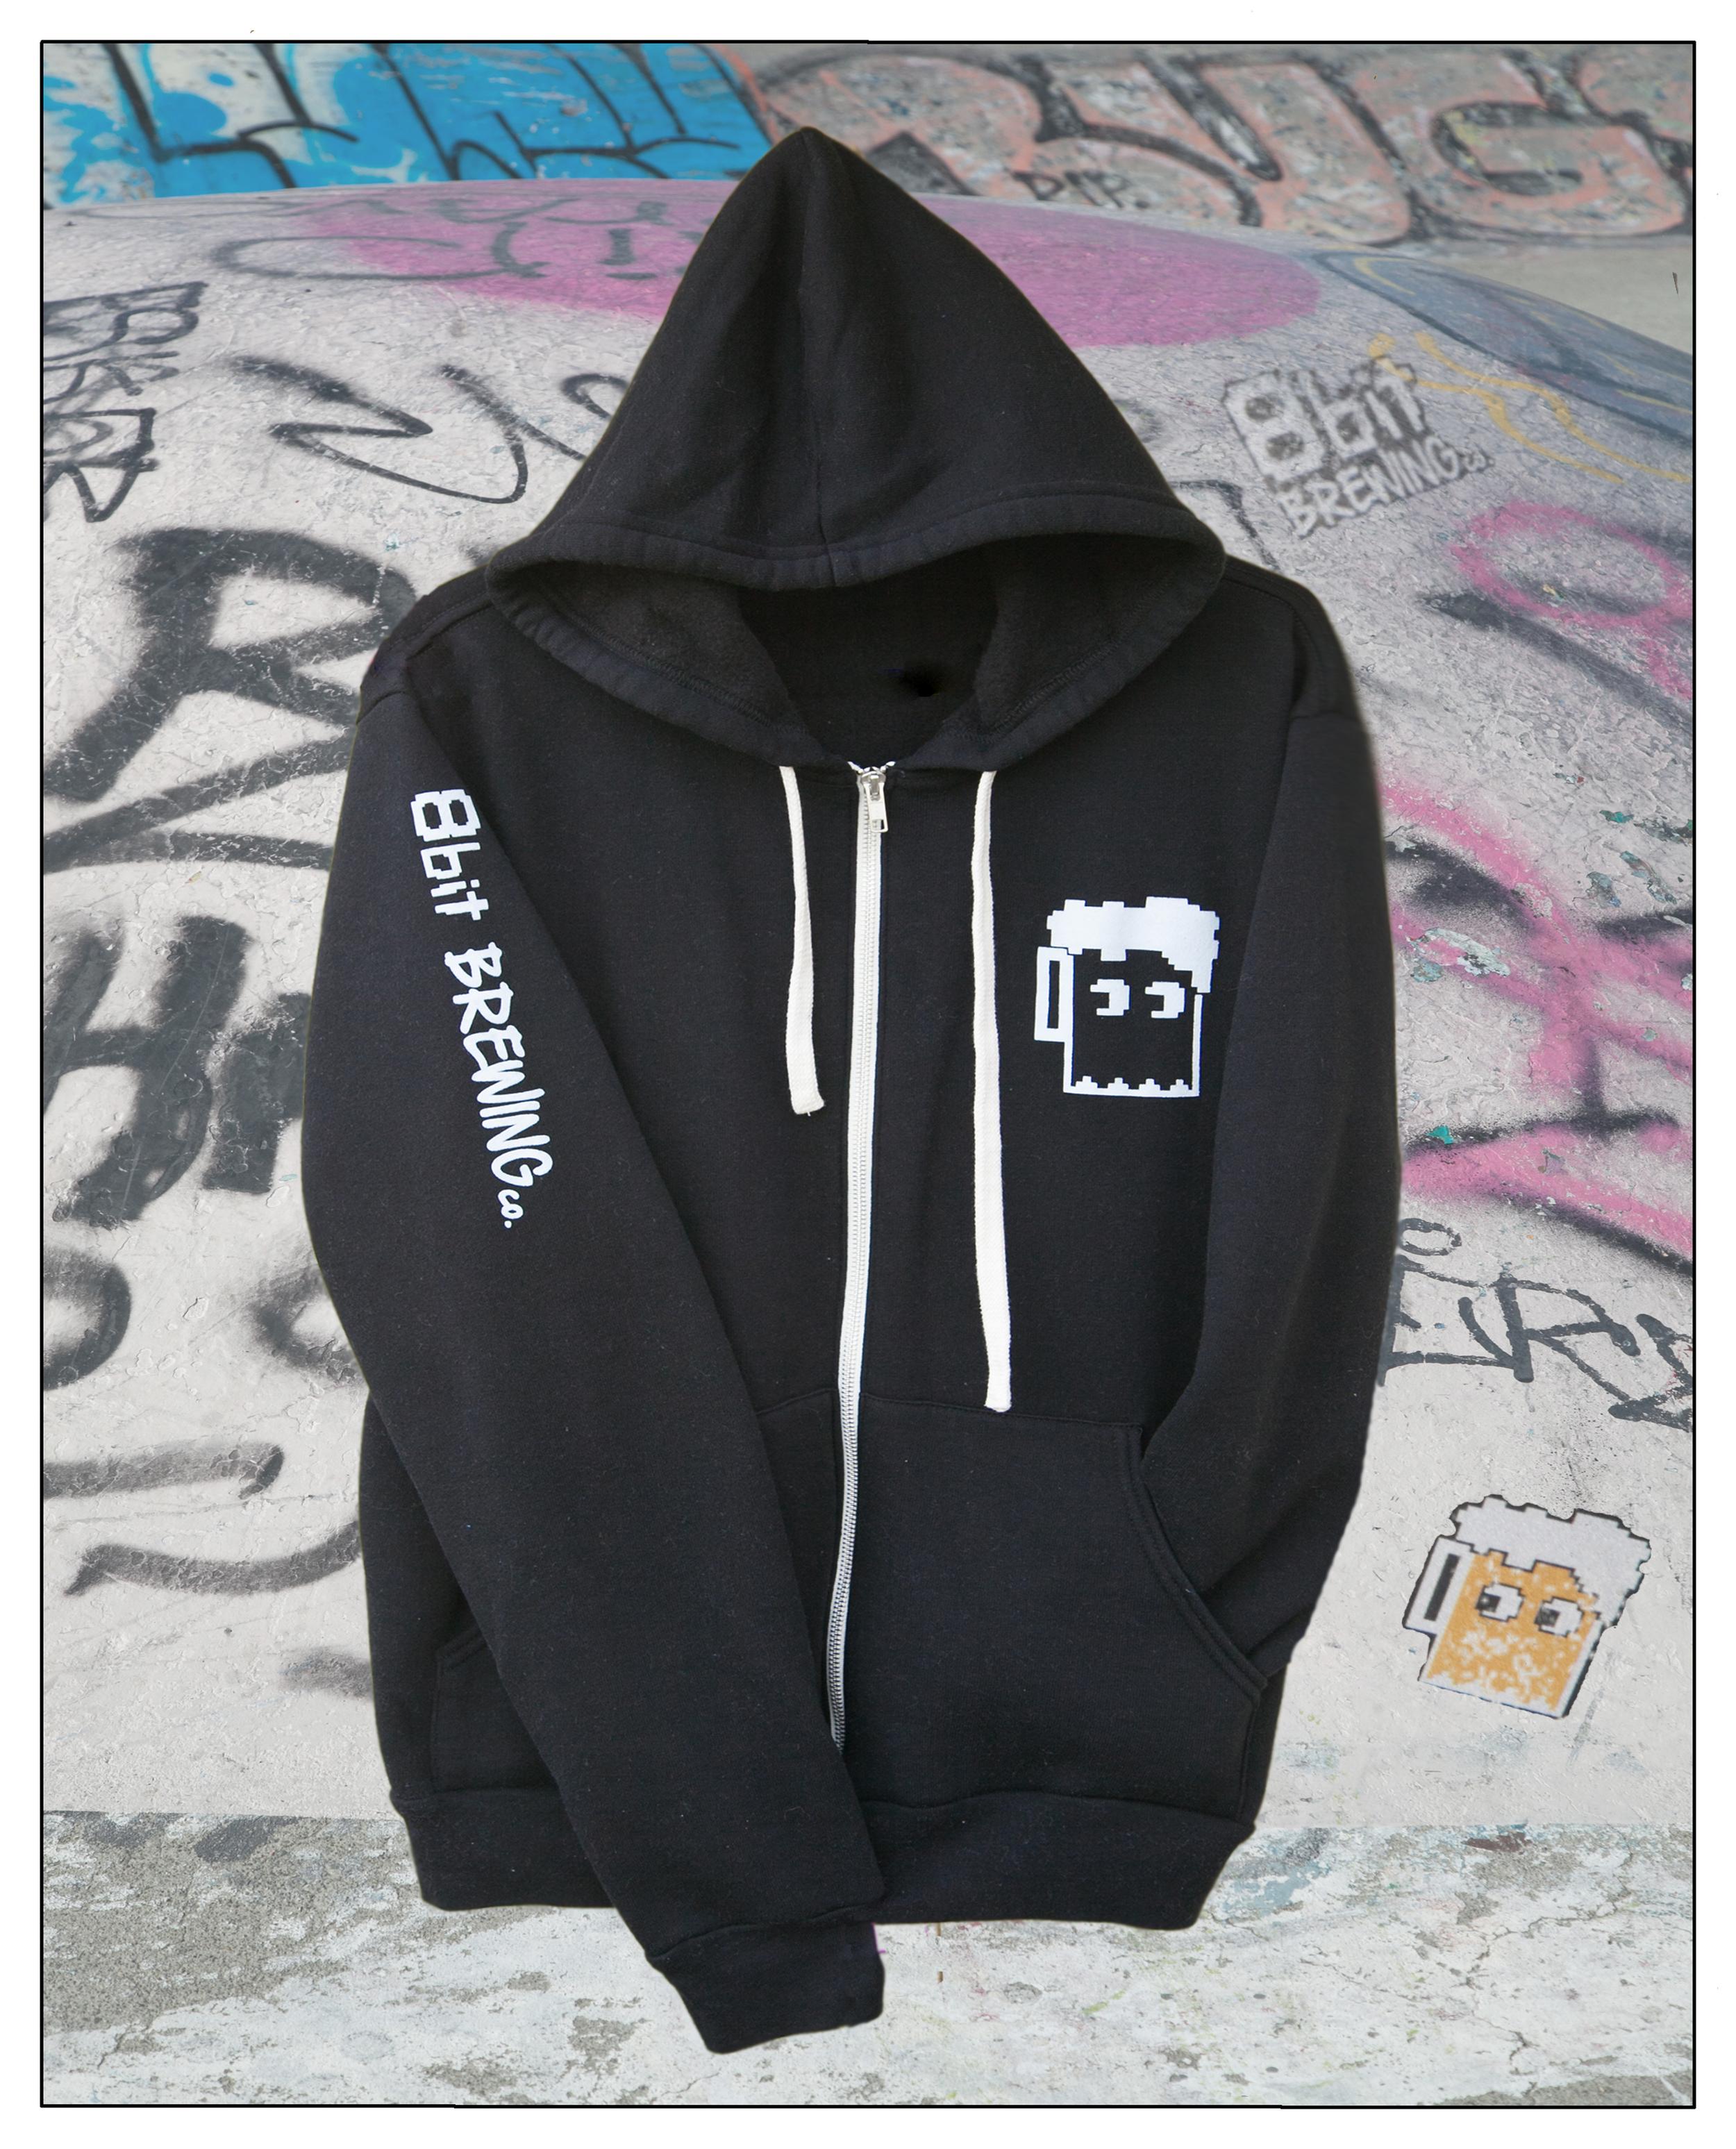 8Bit_sweatshirt_black.jpg